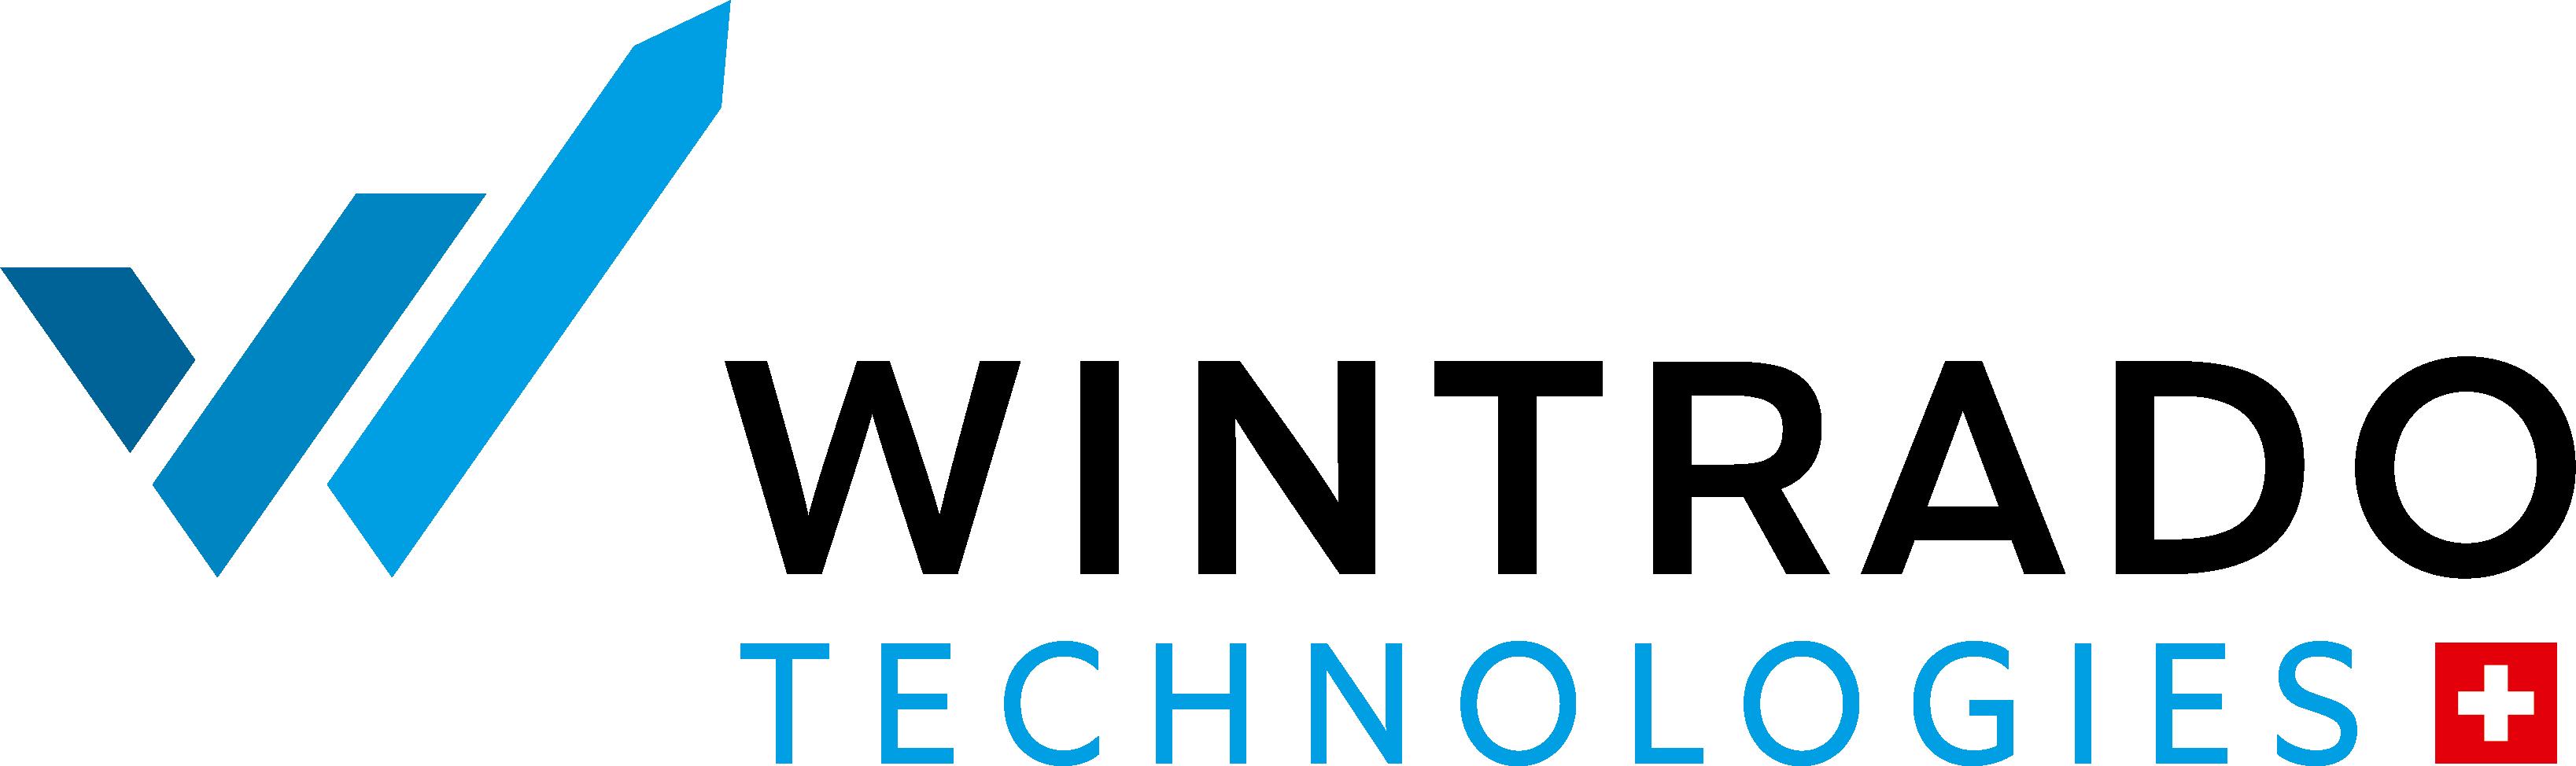 Wintrado Technologies AG